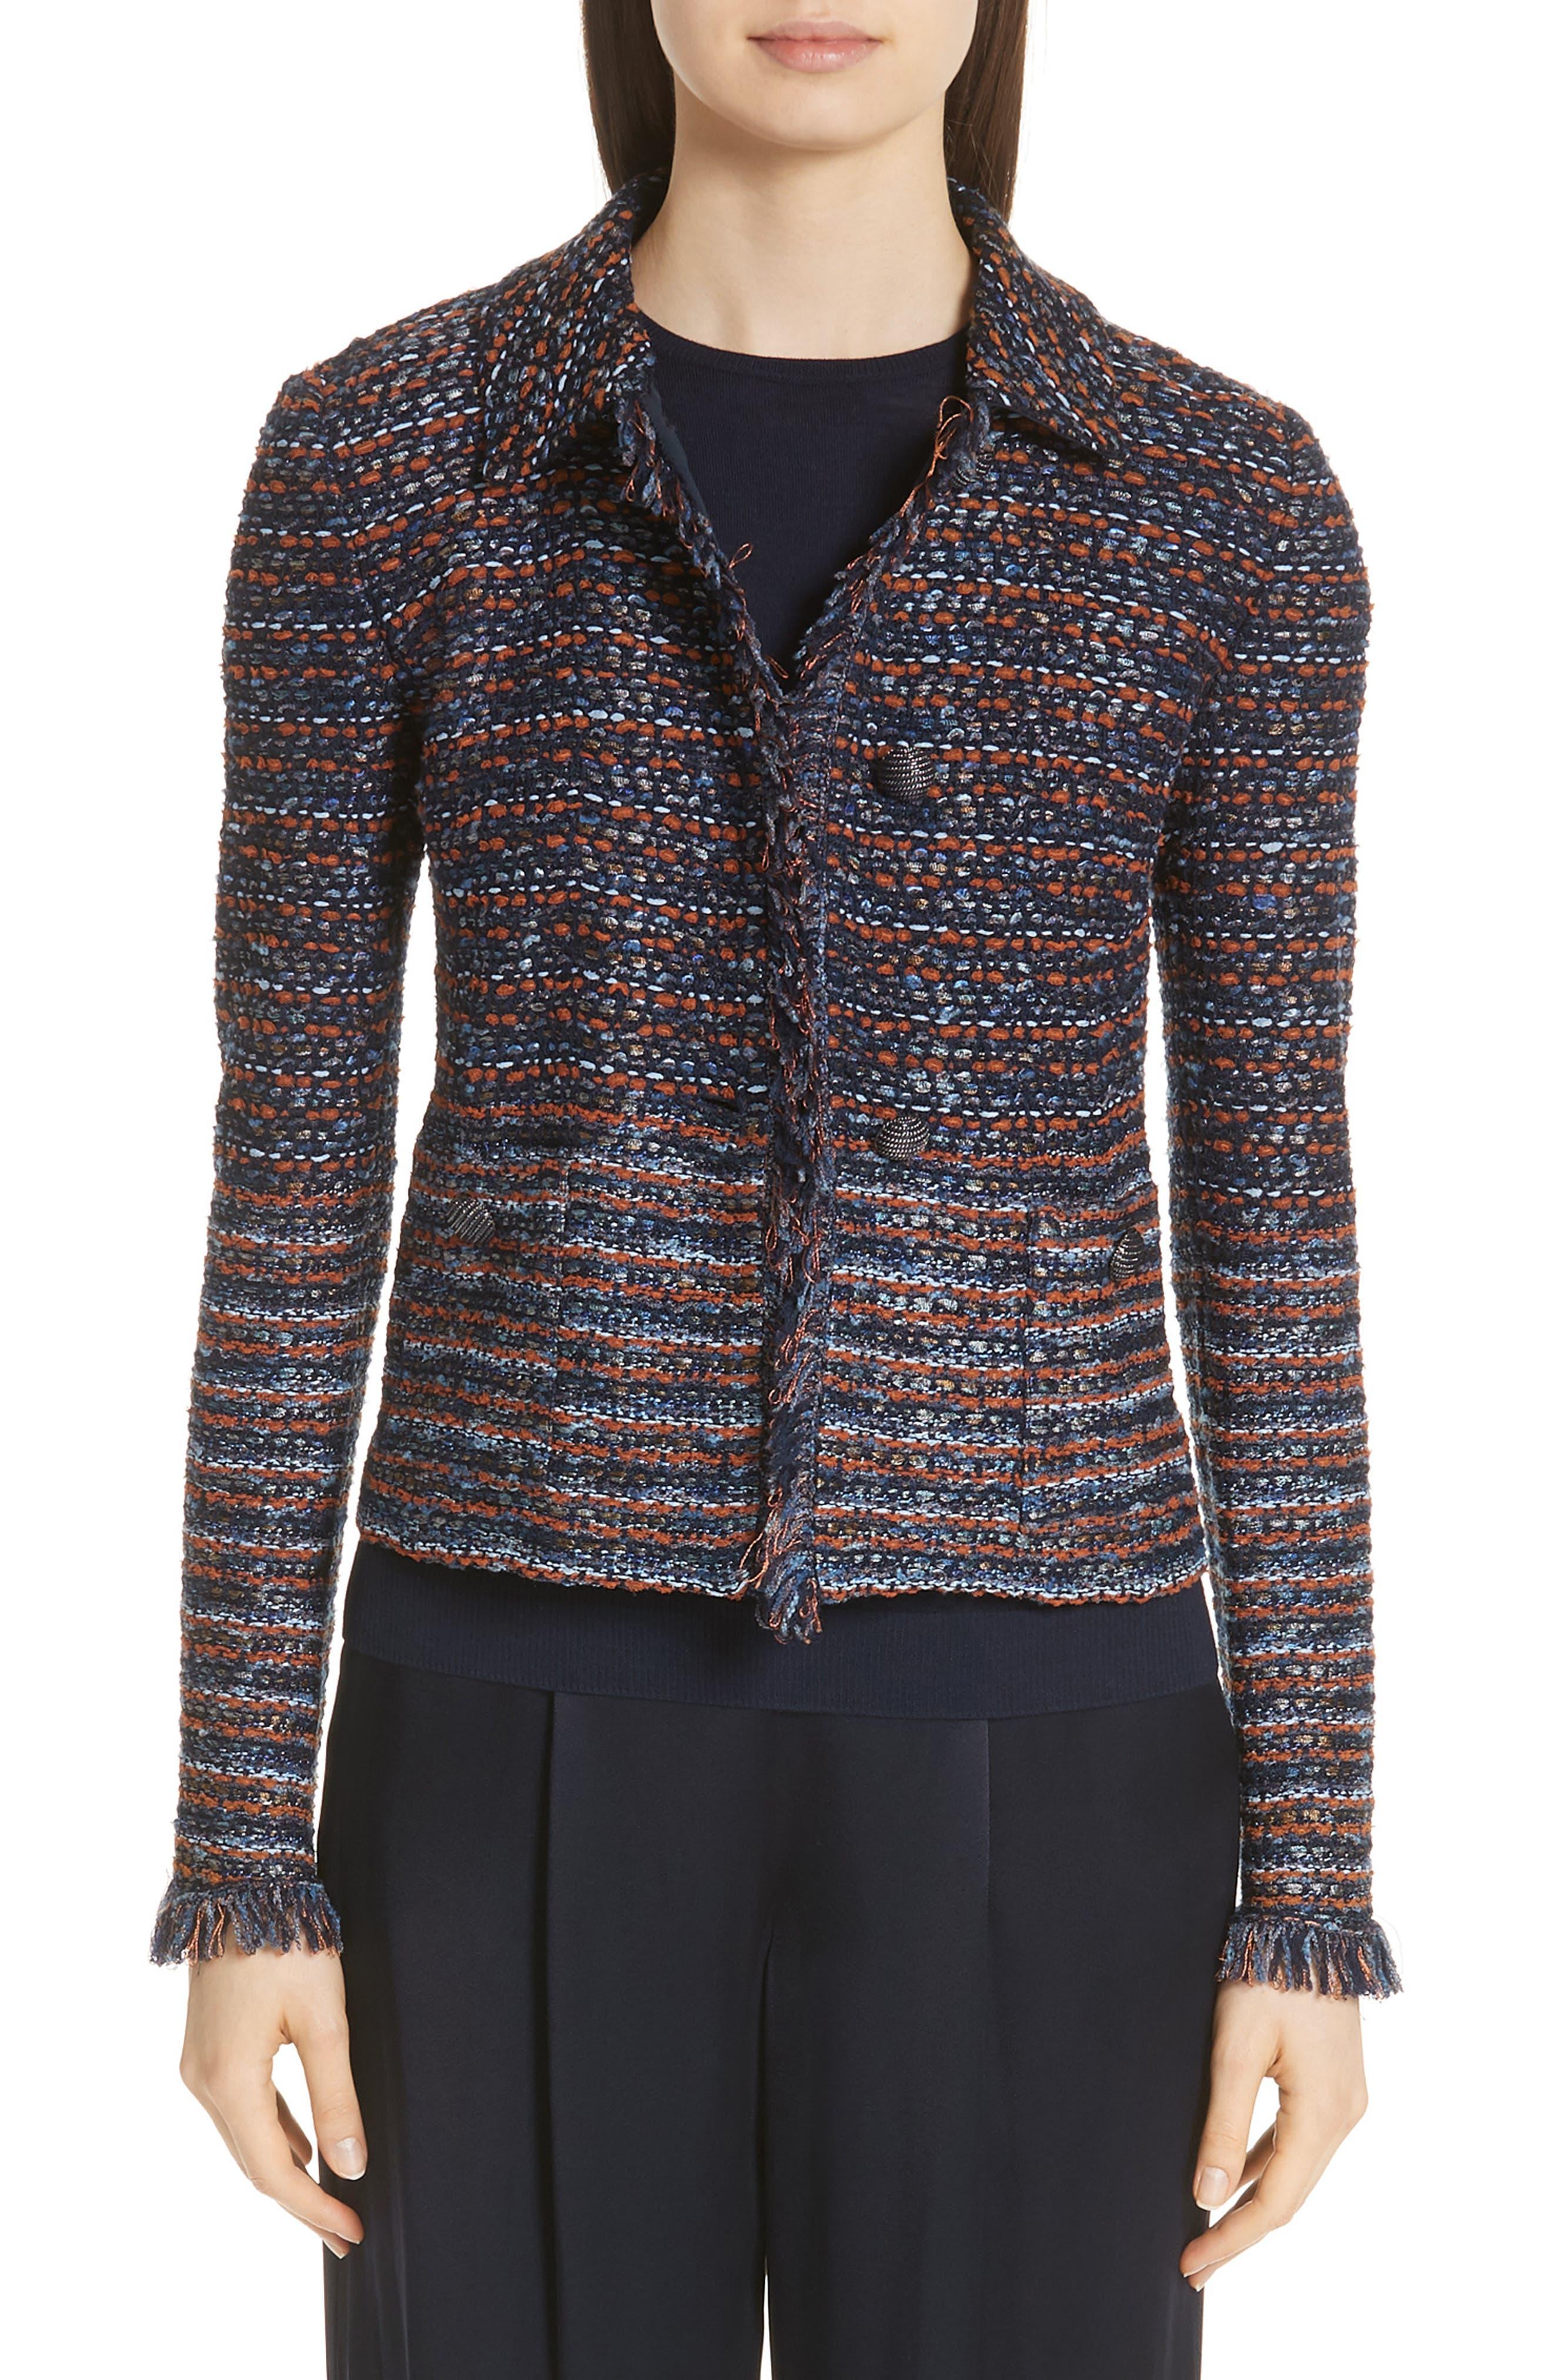 Ombre Ribbon Knit Fringe Jacket in Navy/ Copper Multi